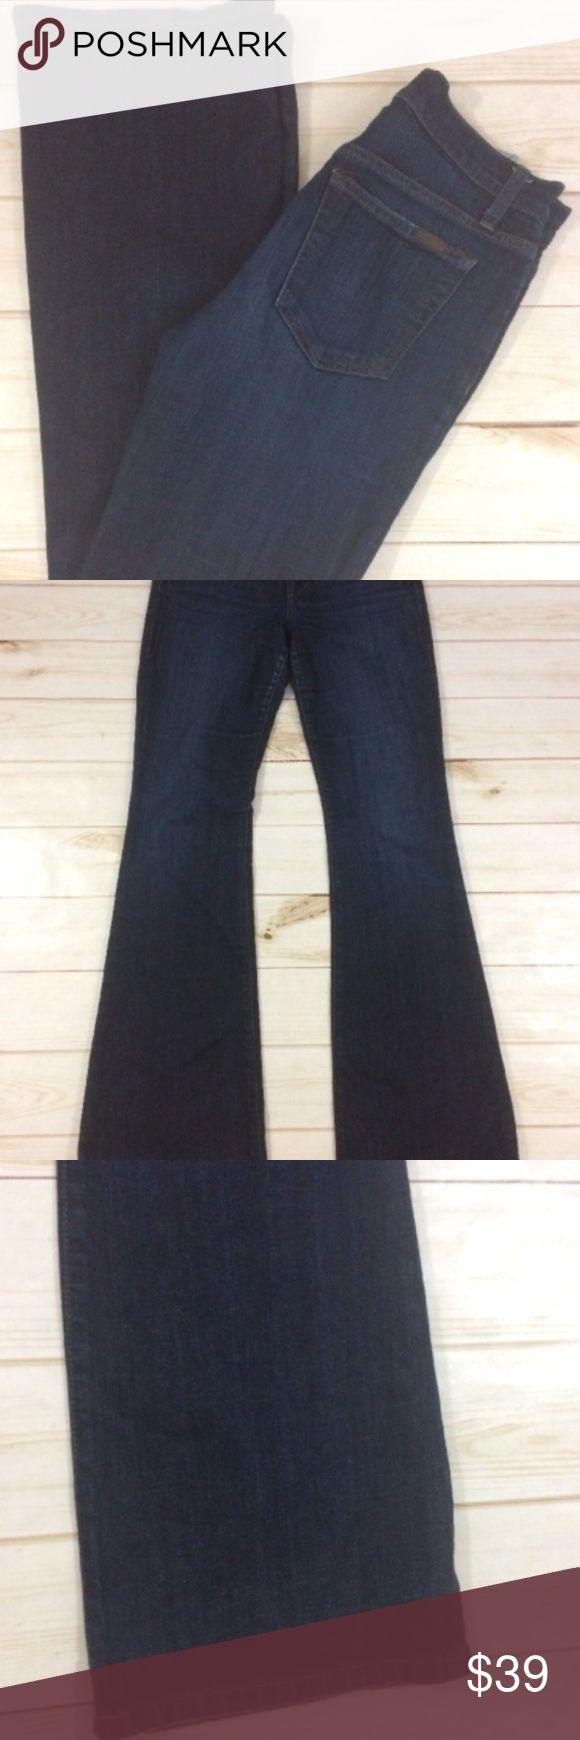 "Joe's Women's High Rise Flare Dark Wash Dixie Joe's Women's High Rise Flare Dark Wash Dixie Size 26   Approximate Measurements:  Waist: 28"" Rise: 10"" Inseam: 33'  A568-P2 Joe's Jeans Jeans Flare & Wide Leg"